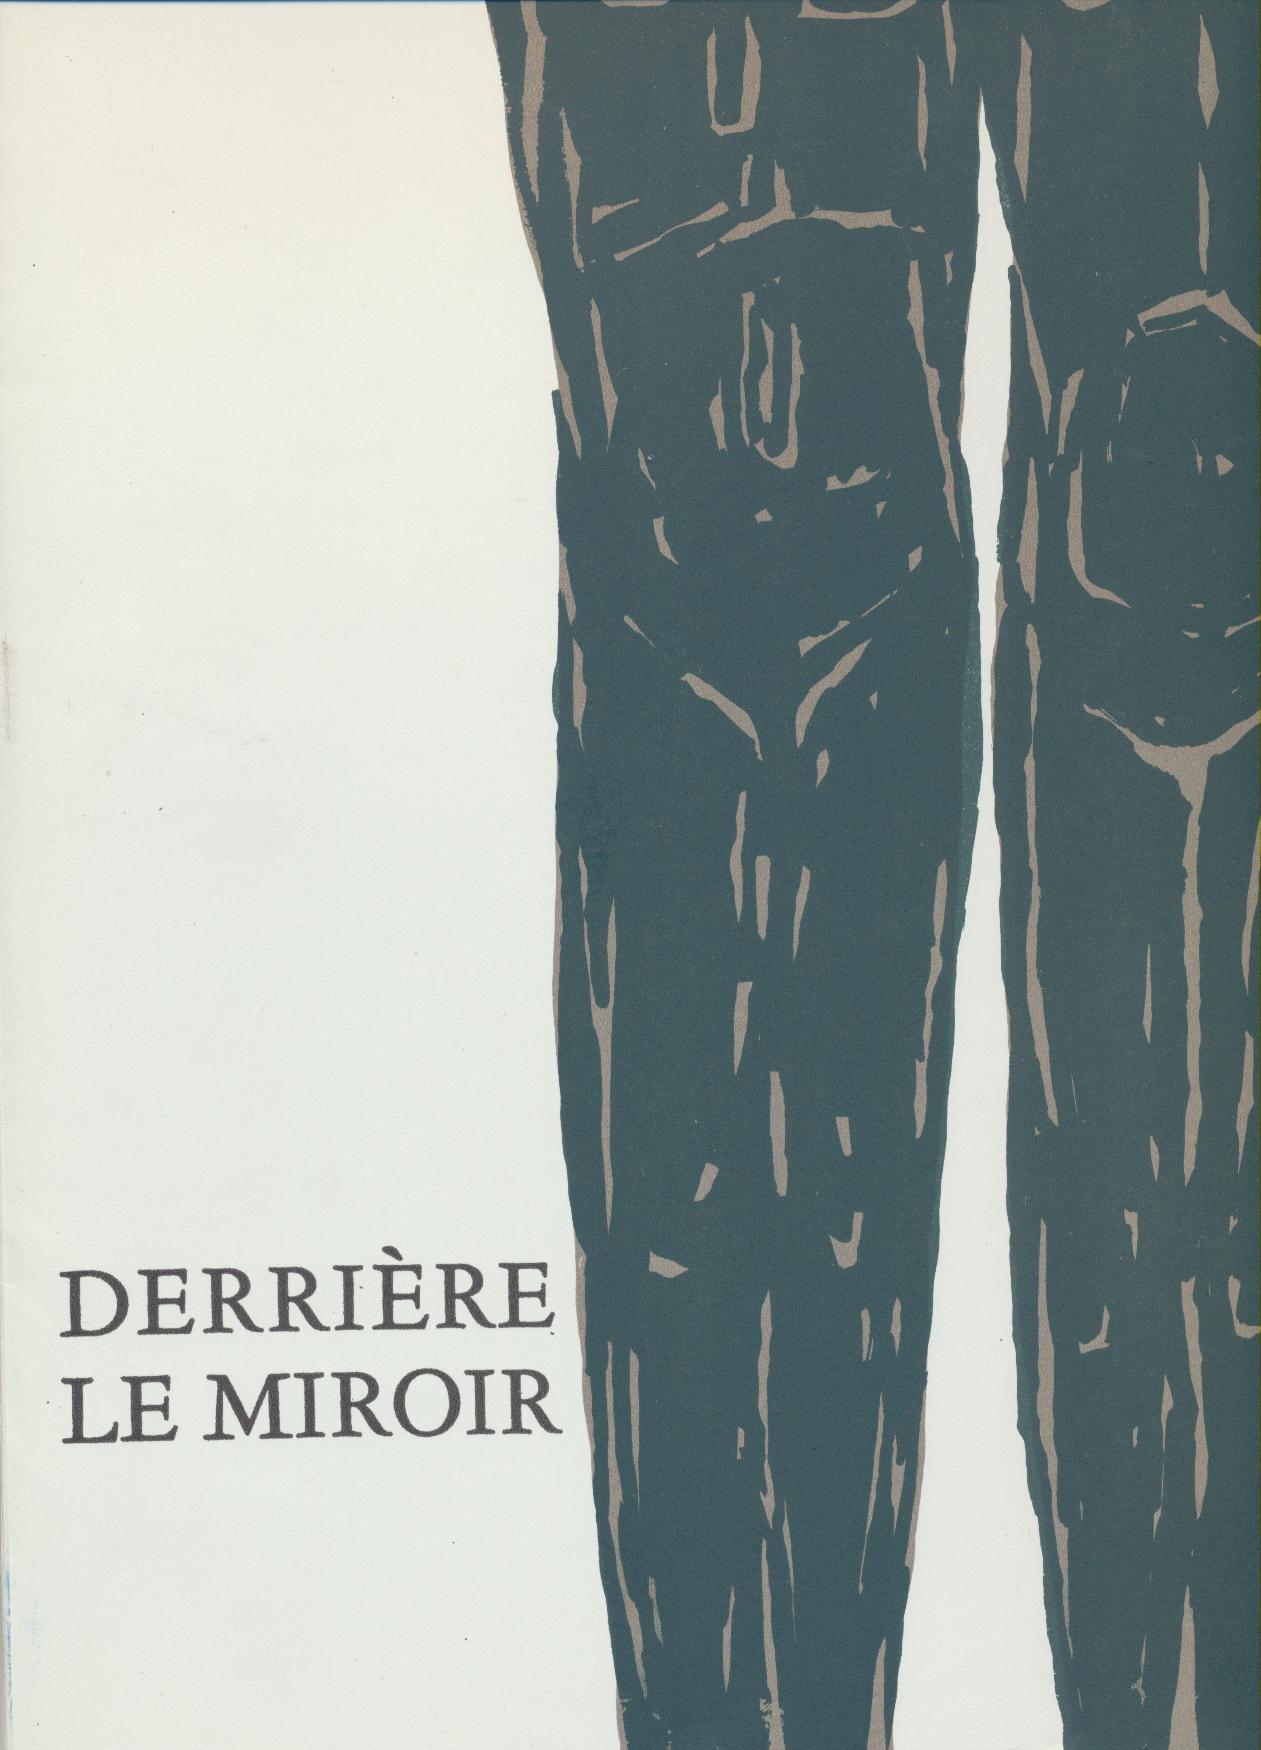 Derri re le miroir ubac n 161 yves bonnefoy maeght gravure for Maeght derriere le miroir